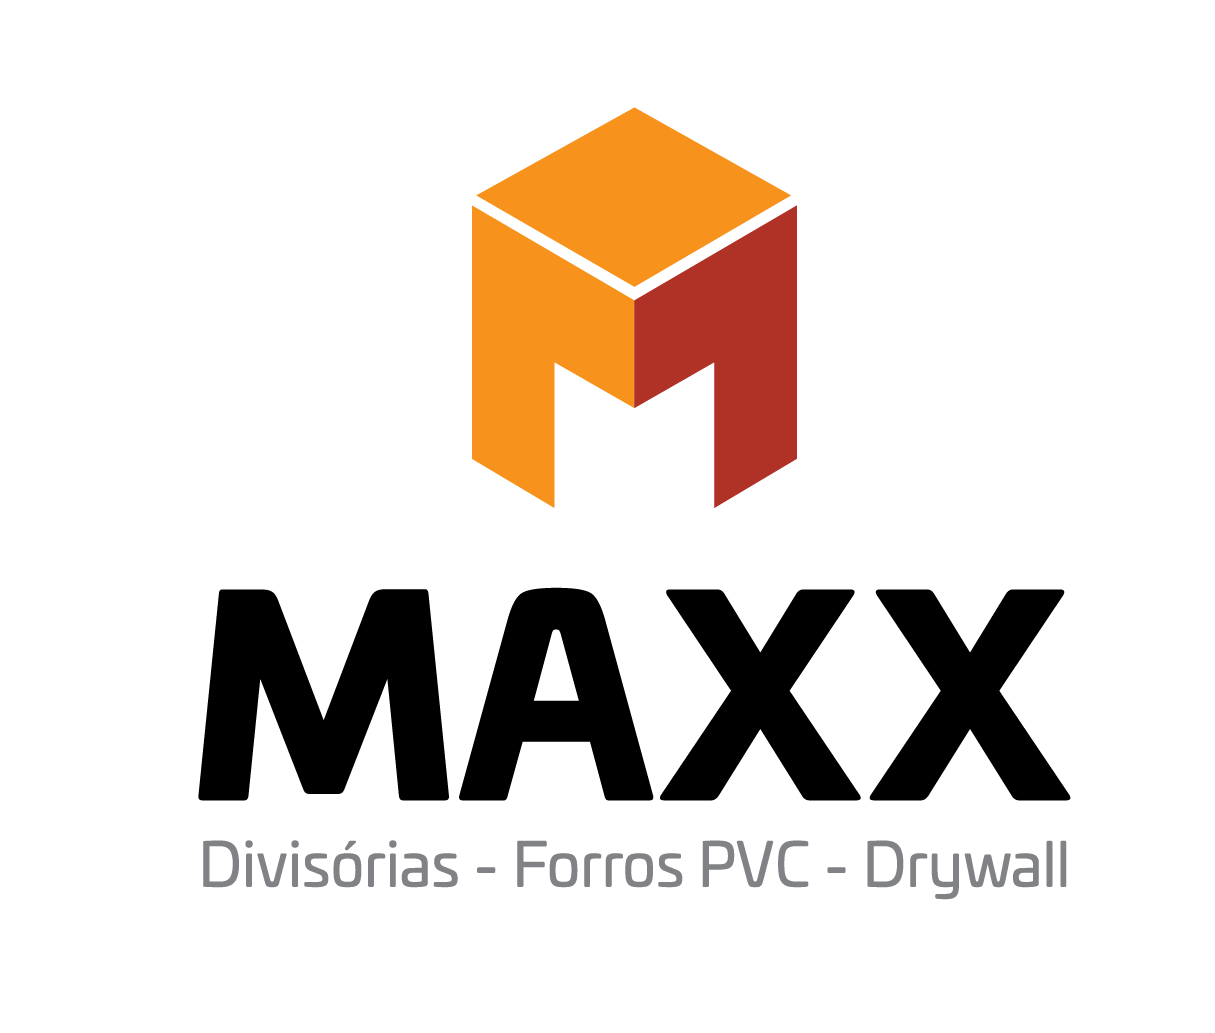 Forro de Pvc Liso Vila Endres - Forro de Pvc Decorado - Maxx Forro